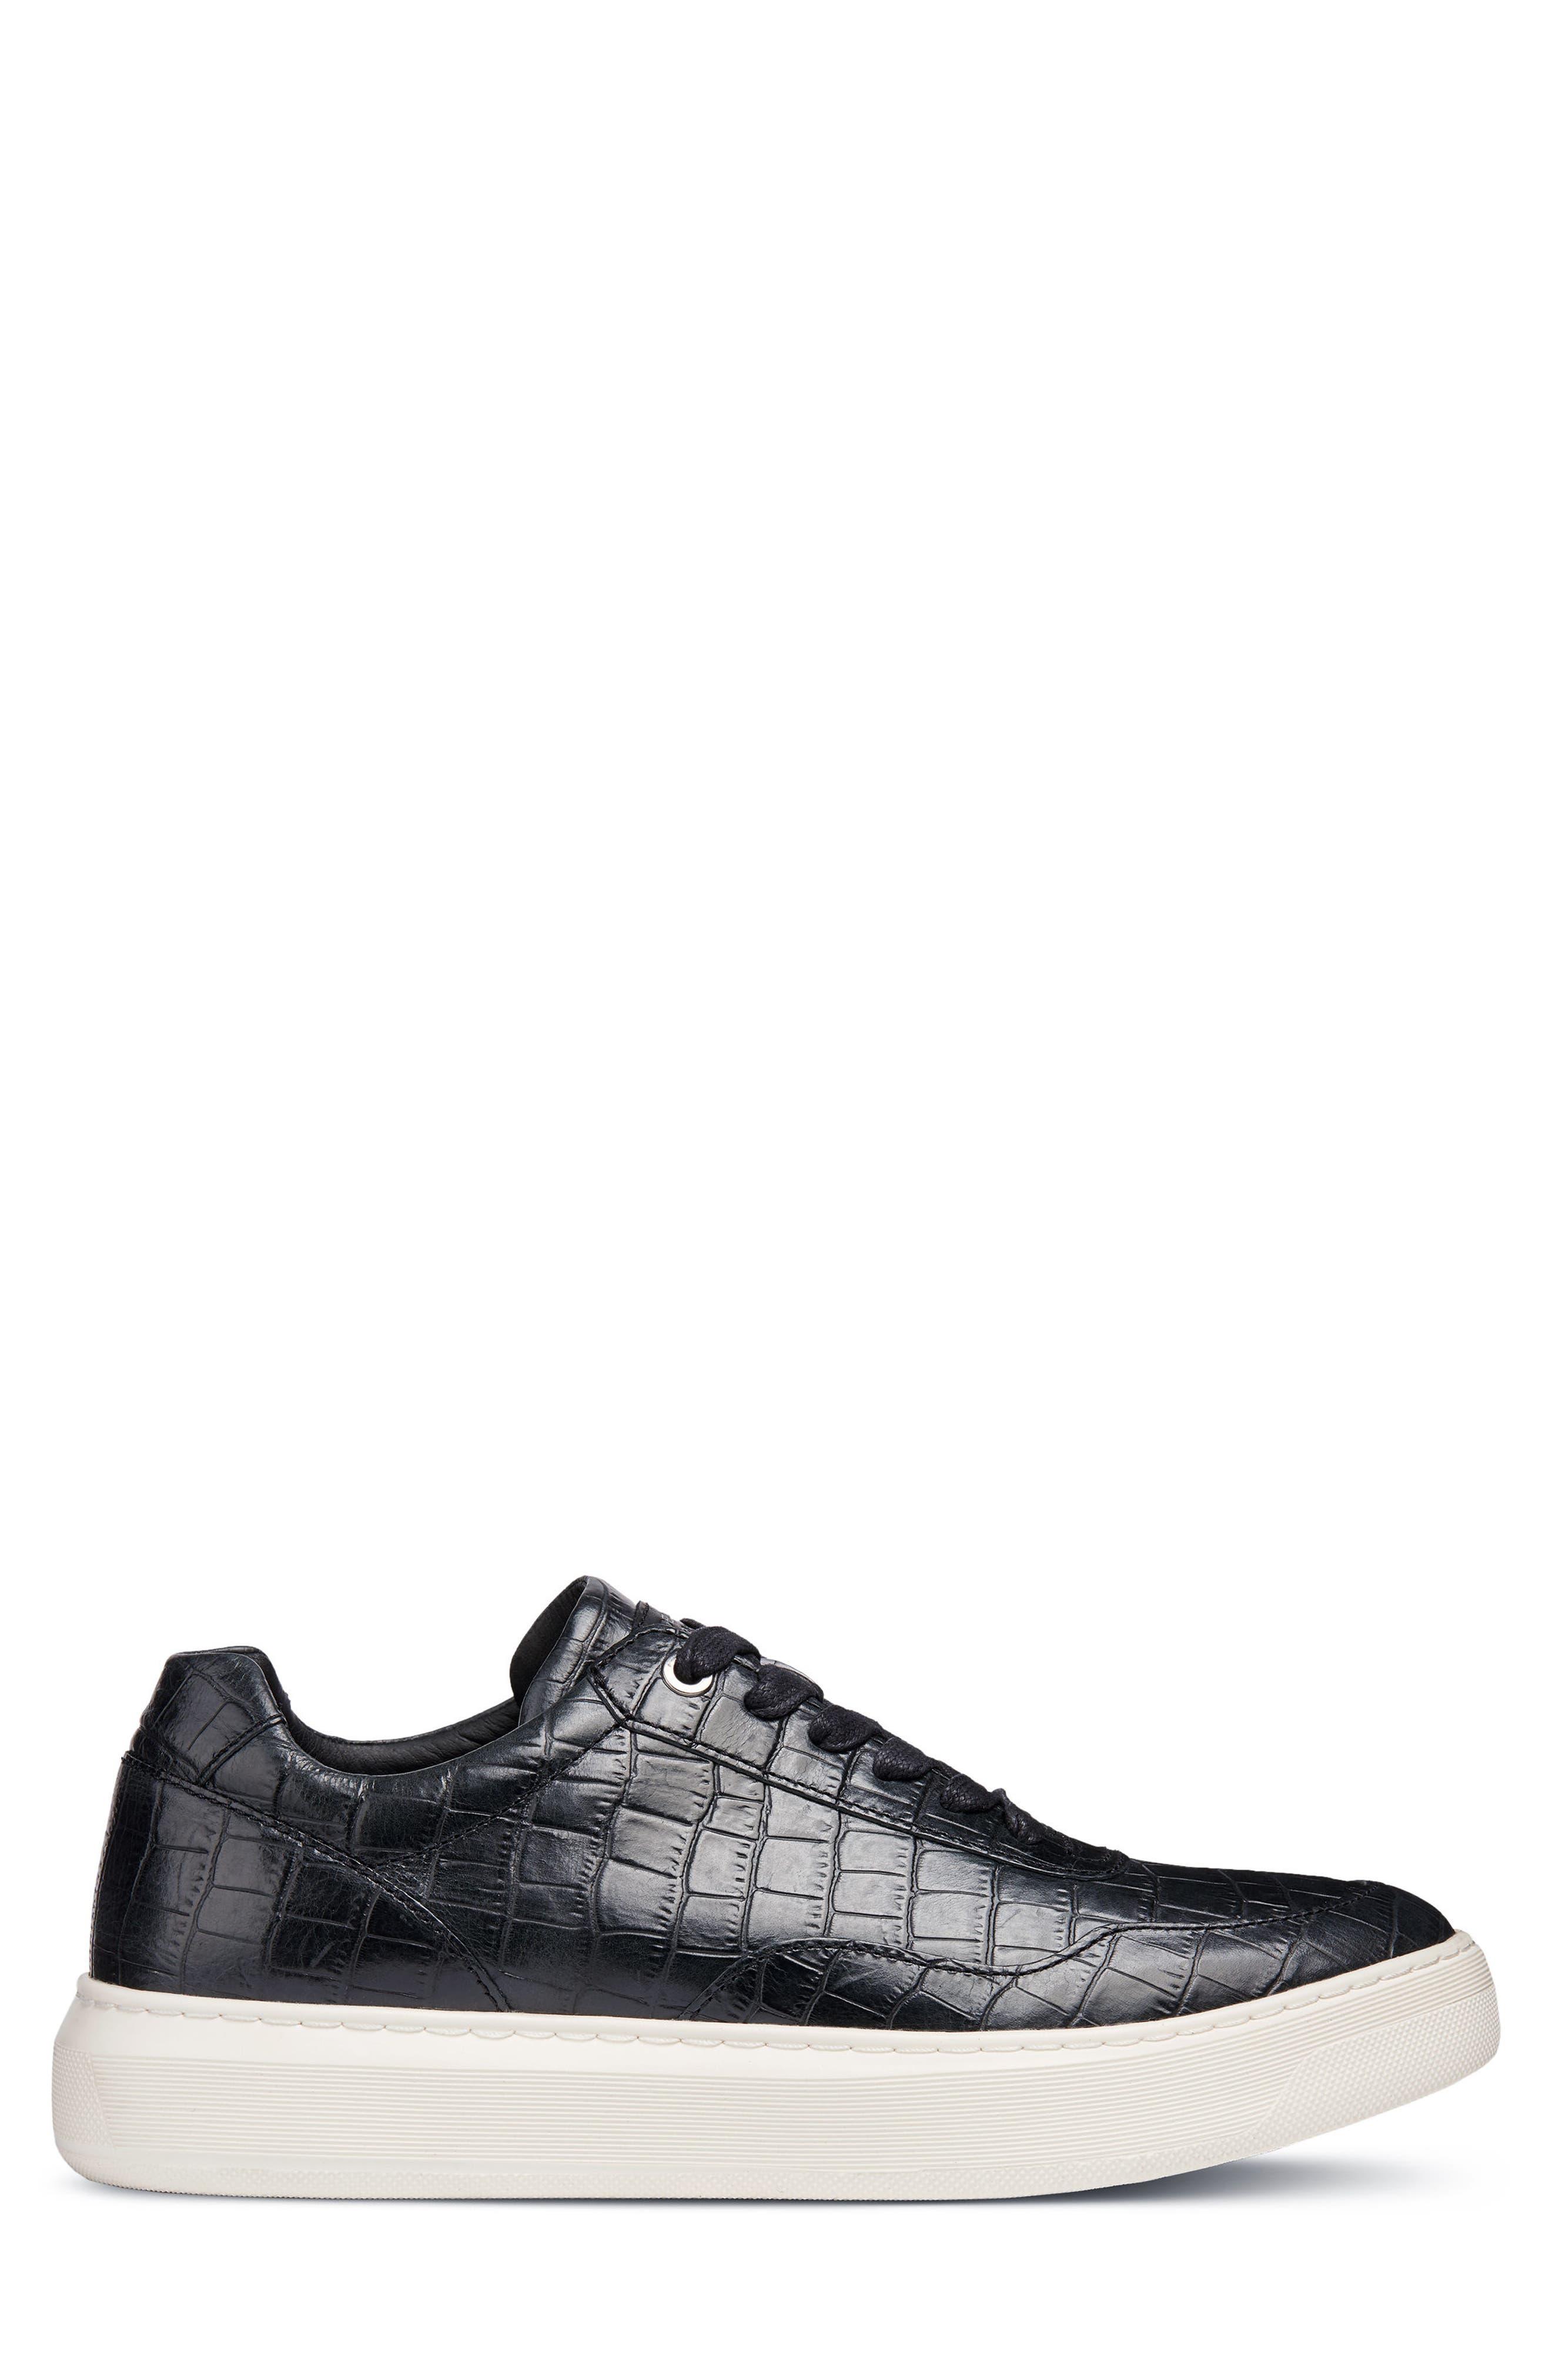 Deiven 8 Croc Textured Low Top Sneaker,                             Alternate thumbnail 3, color,                             BLACK LEATHER